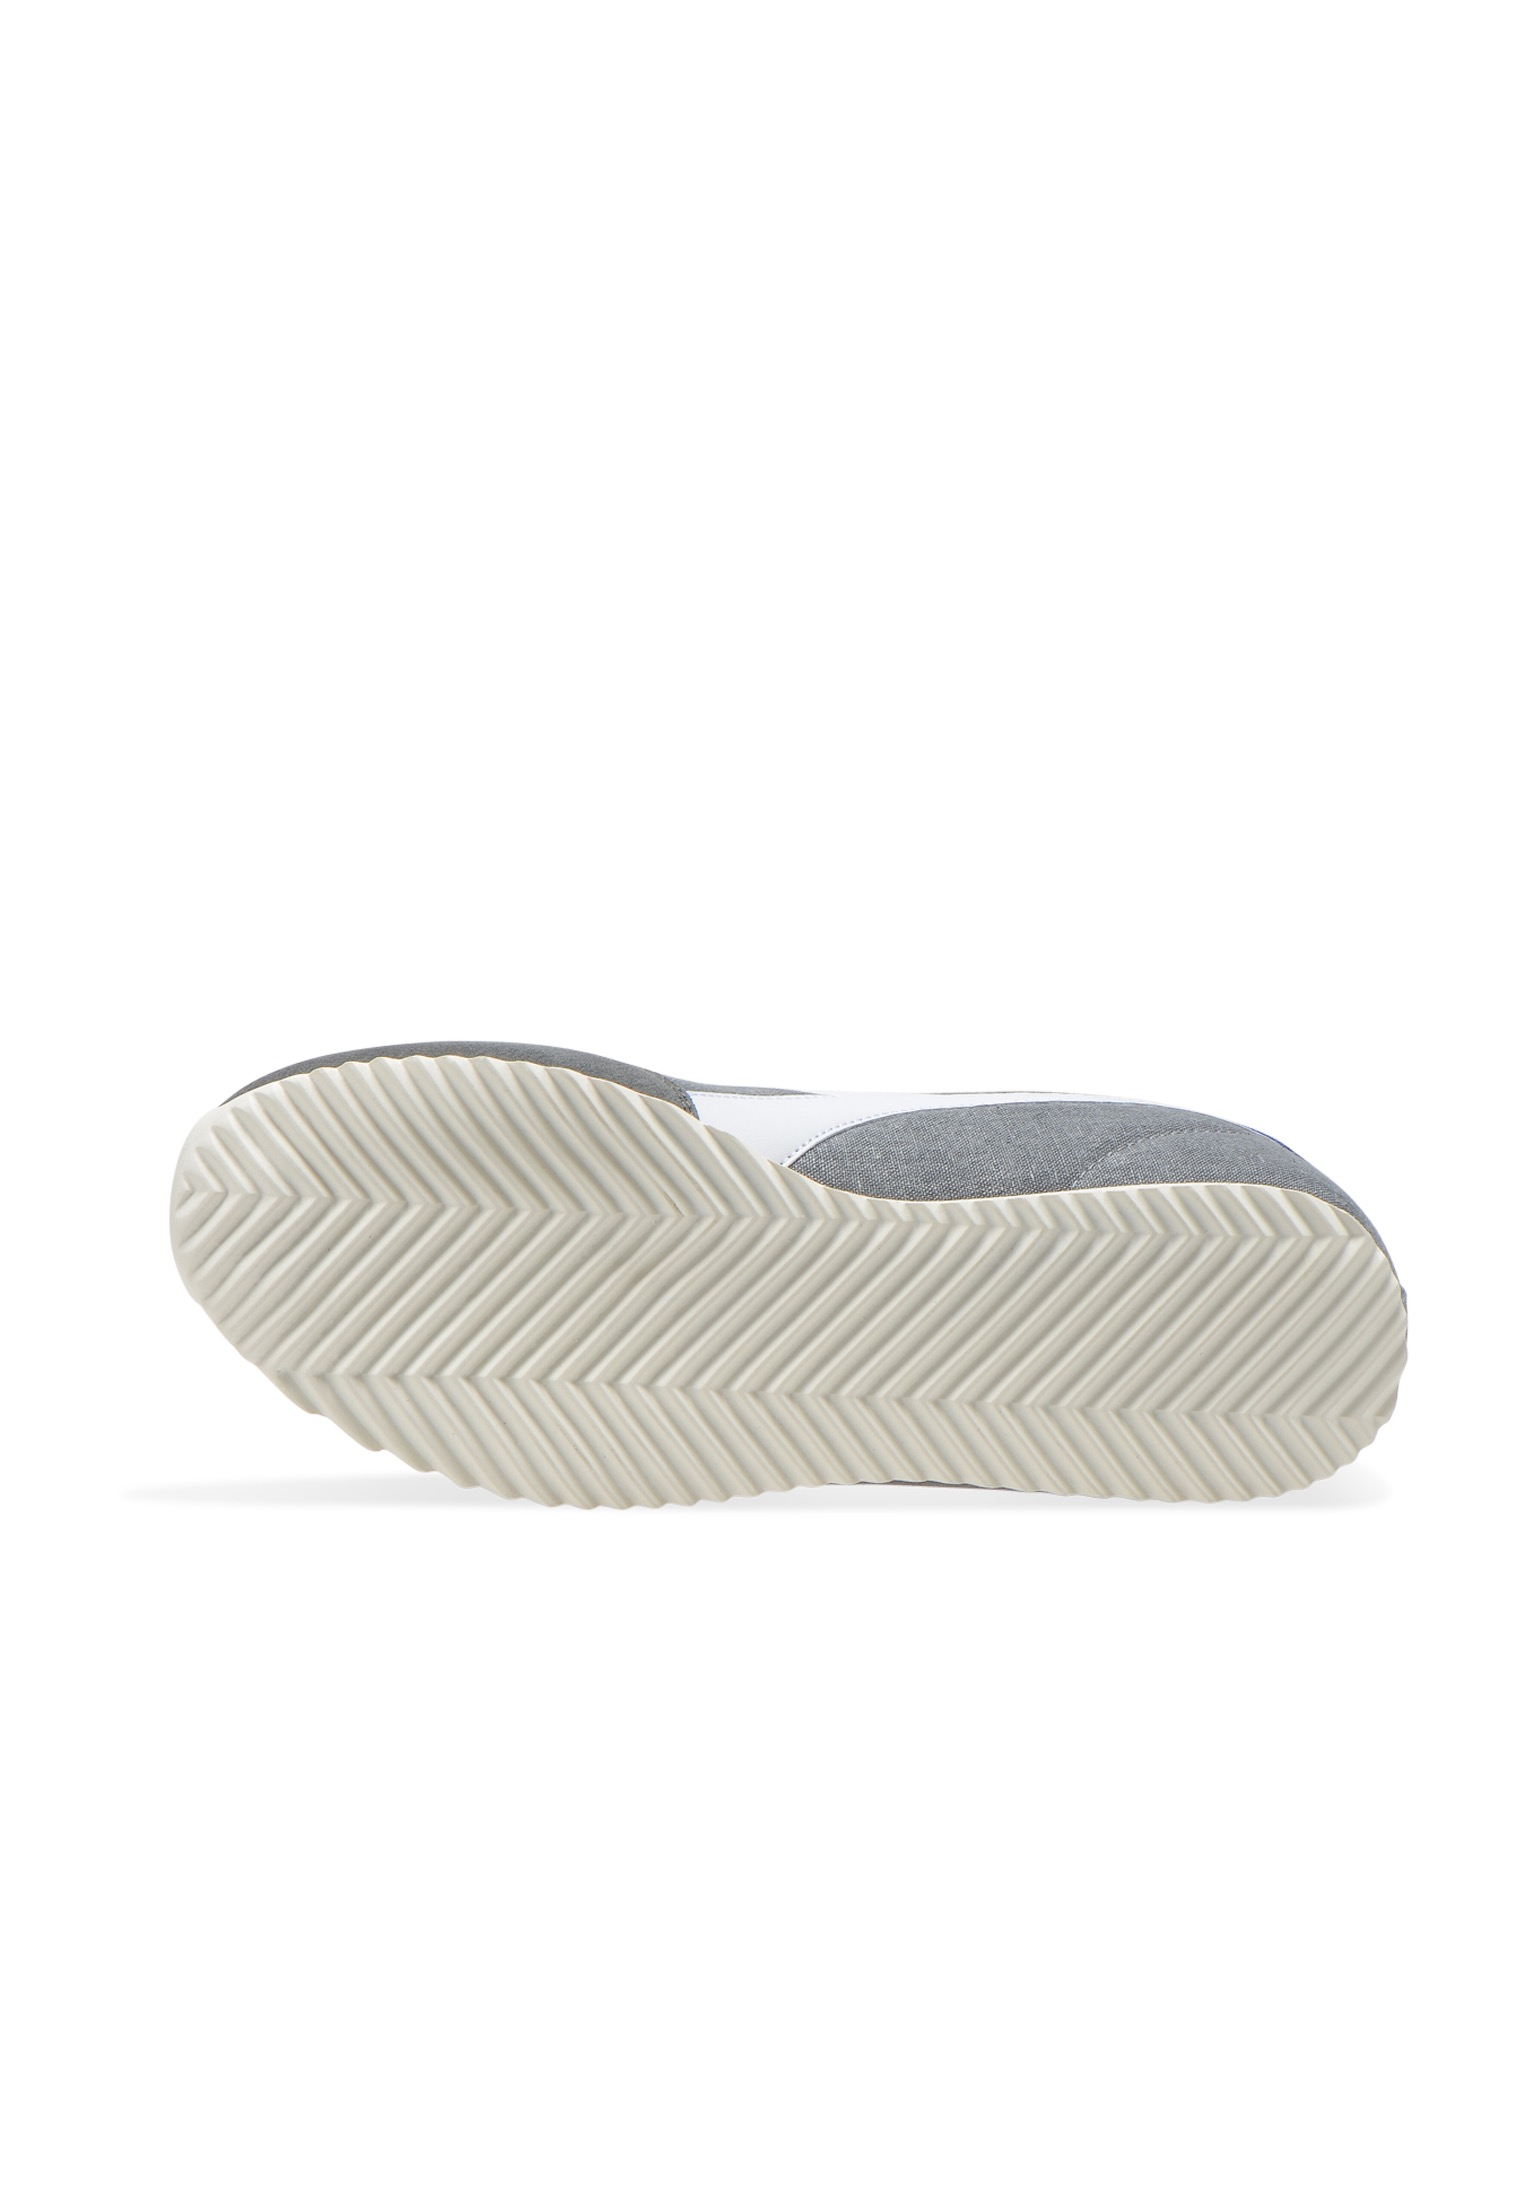 Scarpe-Diadora-Jog-Light-C-Sneakers-sportive-uomo-donna-vari-colori-e-taglie miniatura 70